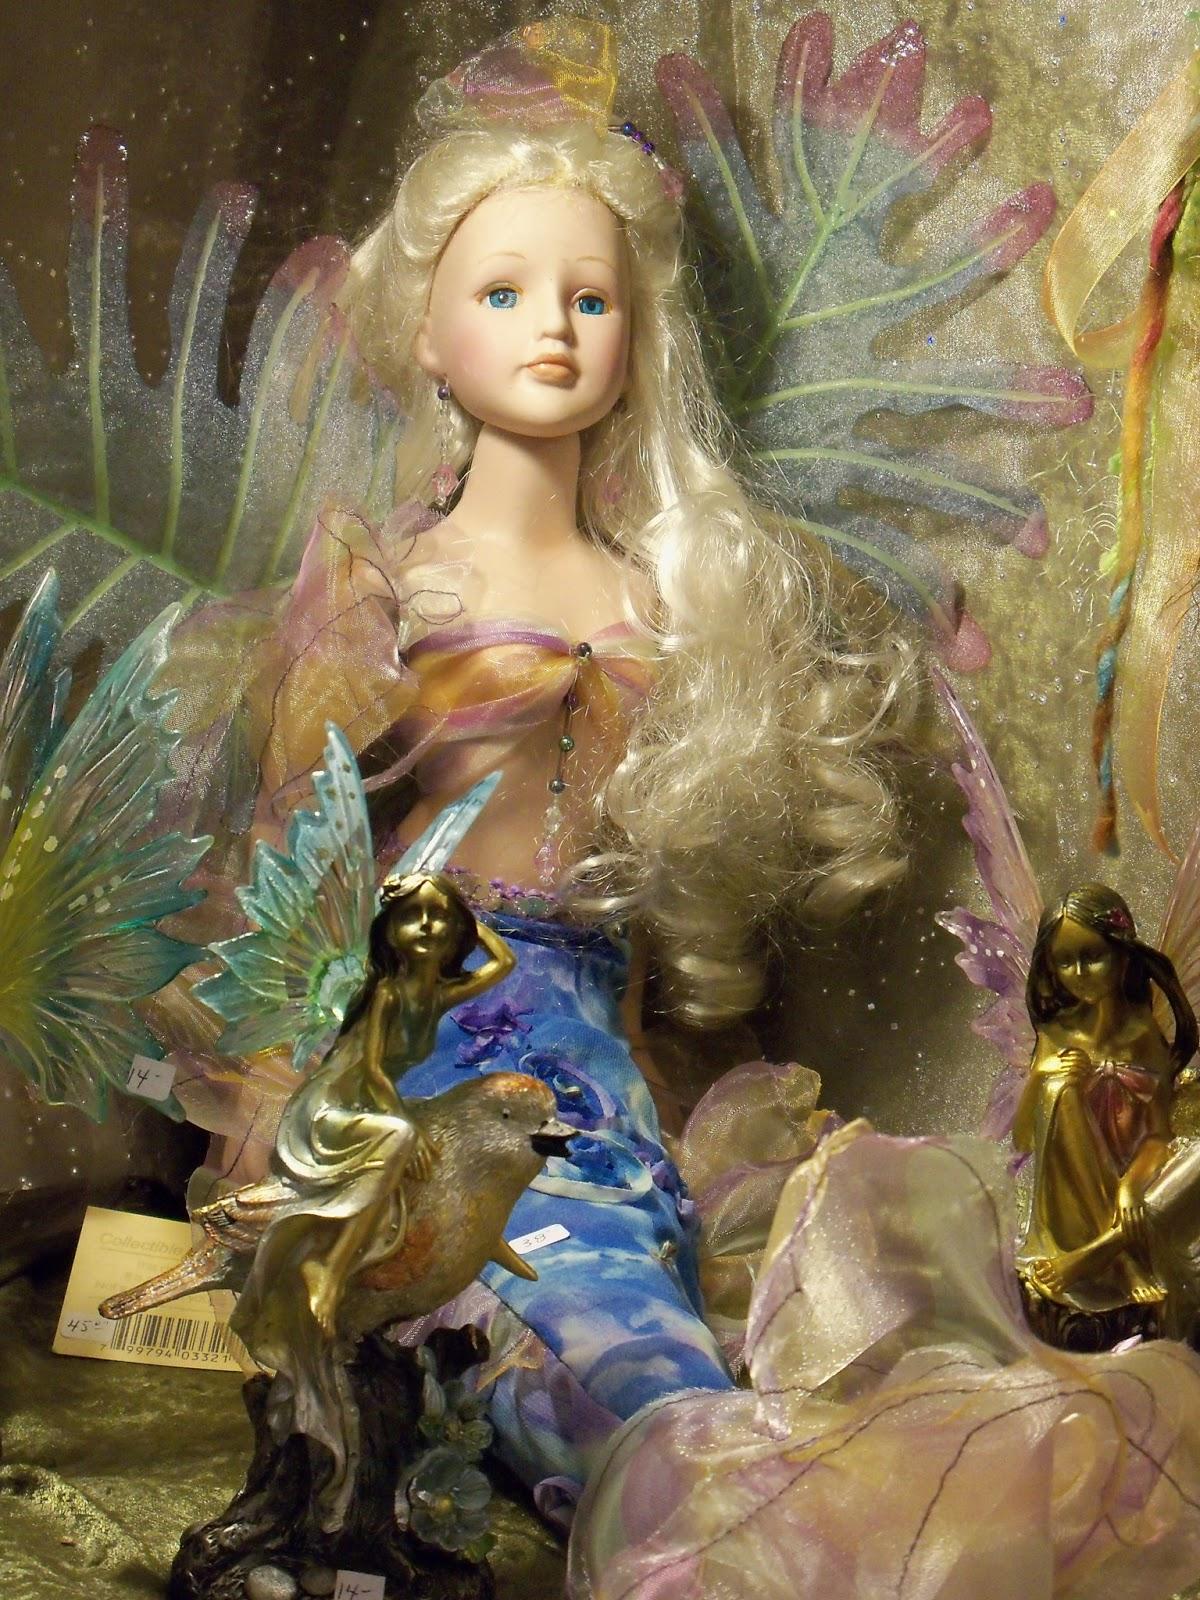 Silver Moon Adornments: BEAUTIFUL THINGS...more Buddhas